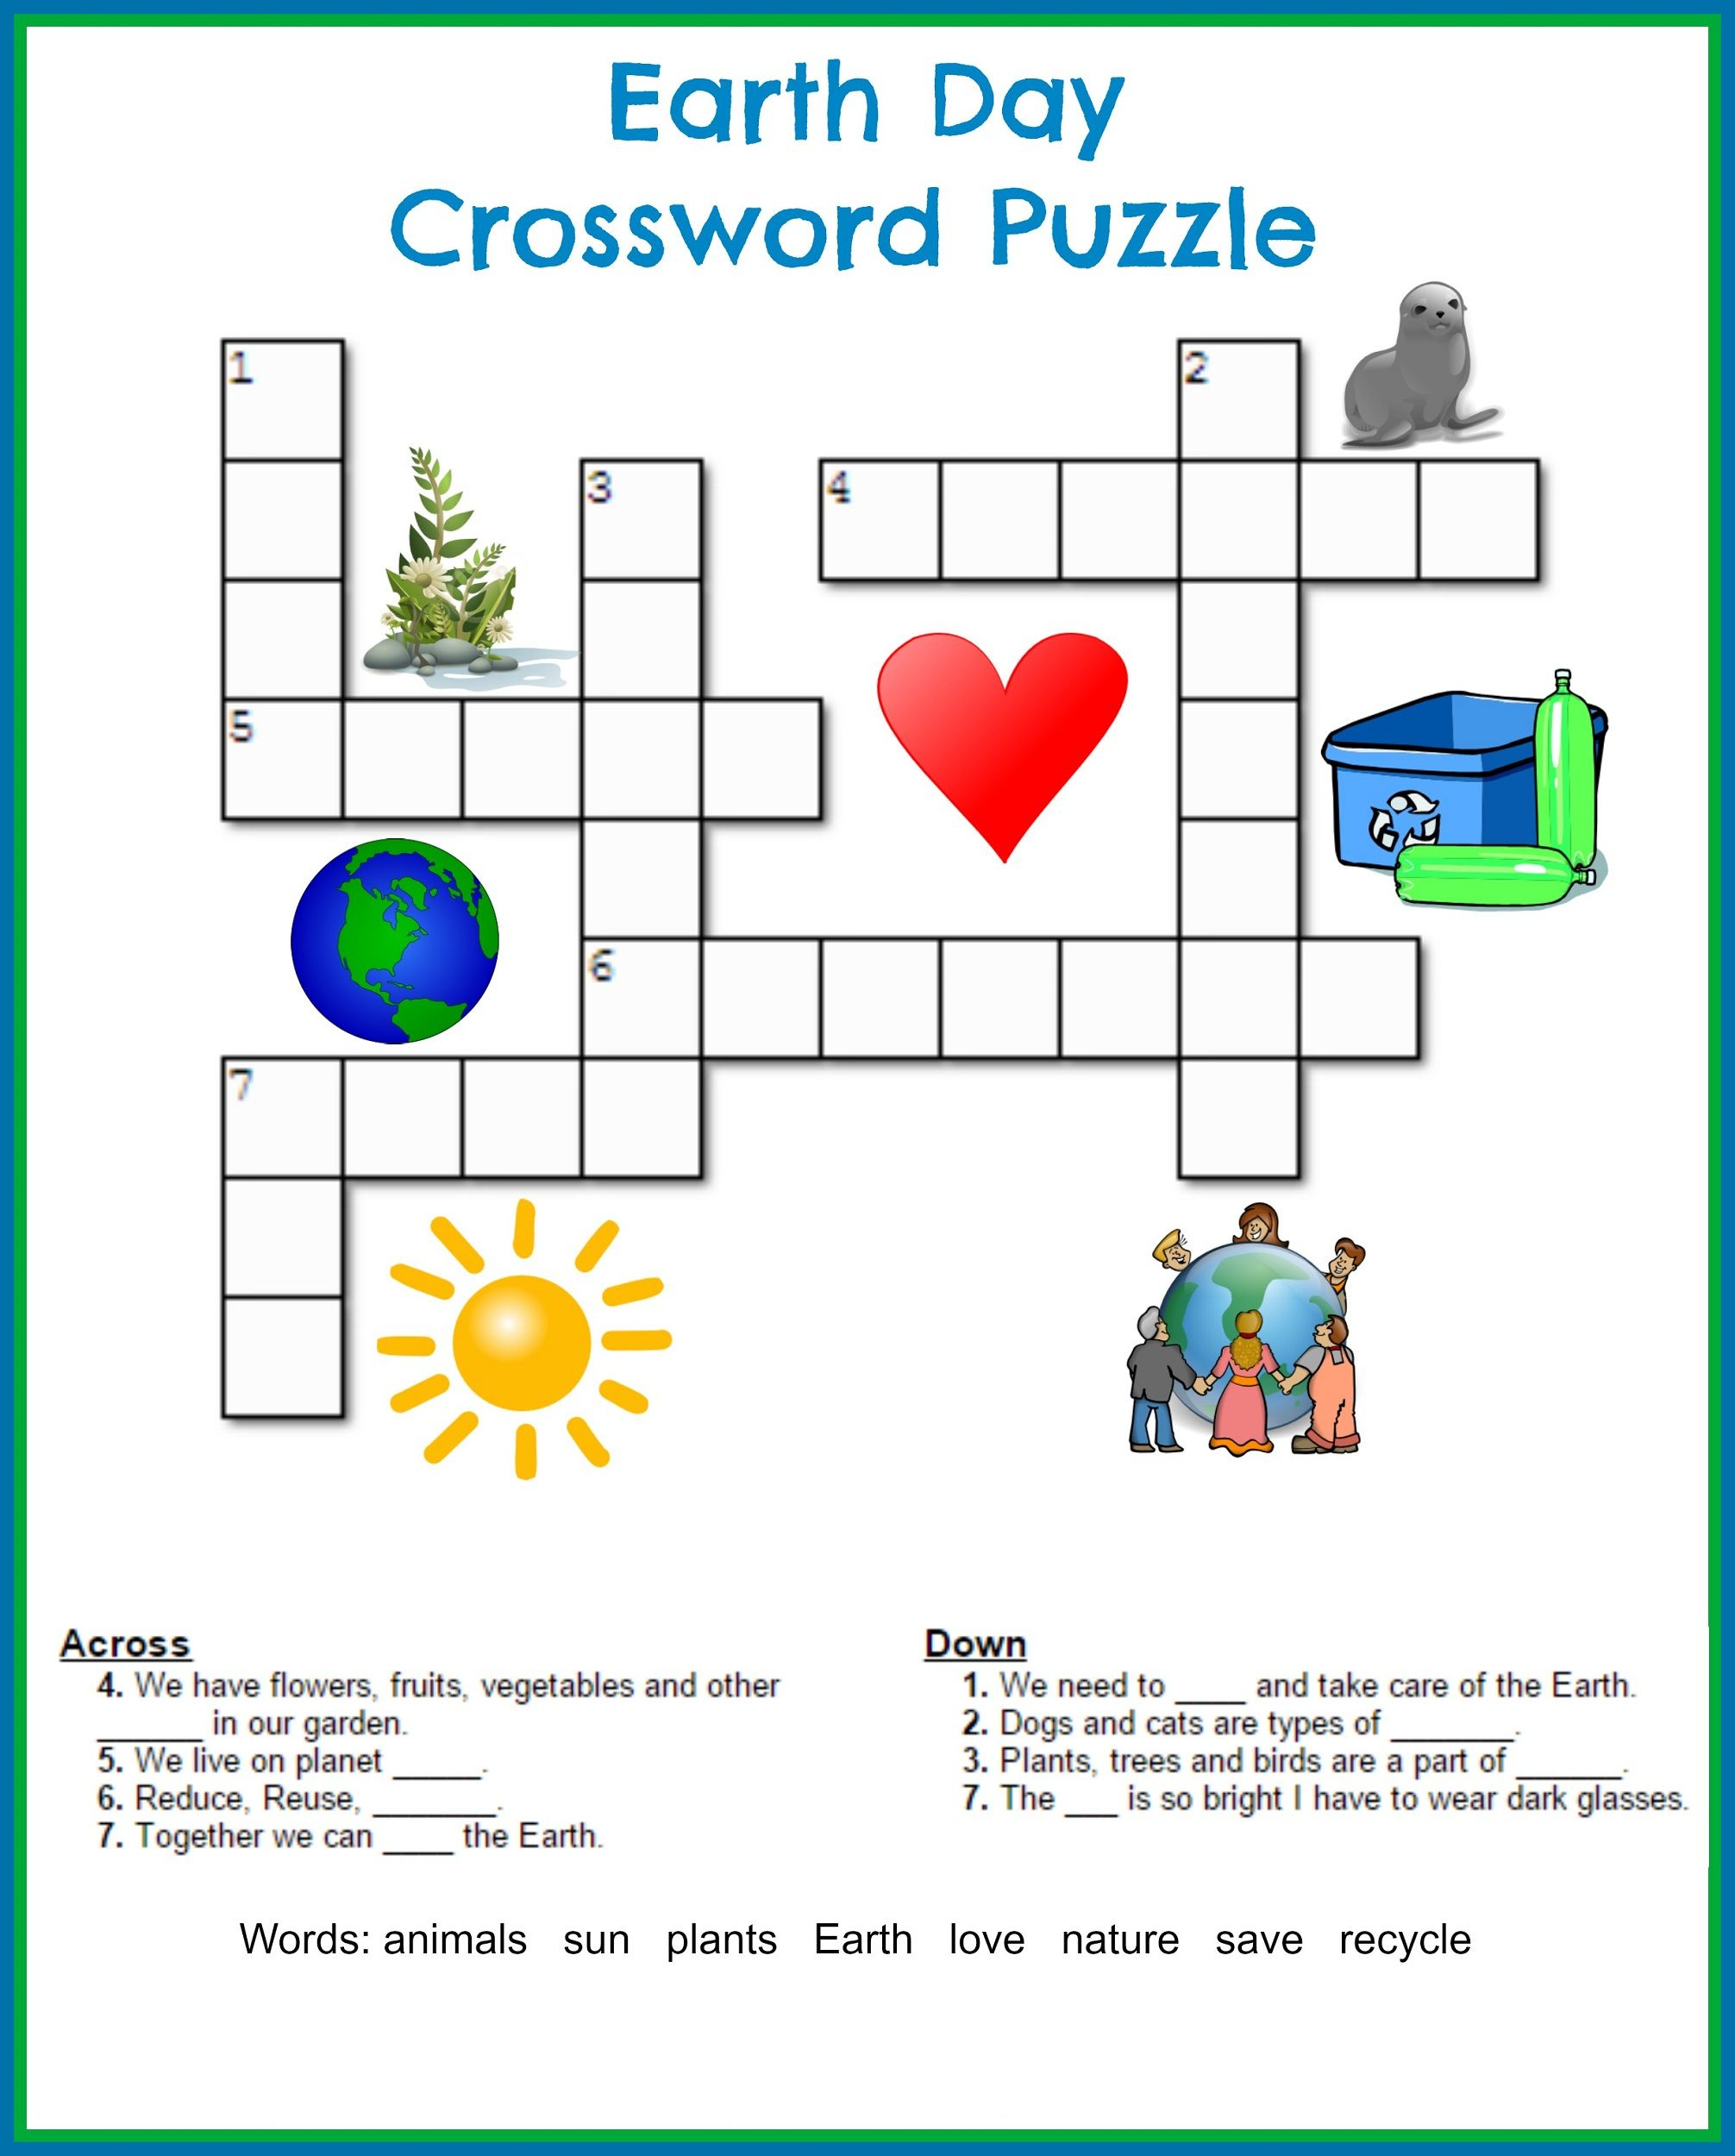 Printable Crossword Puzzles Kids | Crossword Puzzles On Earth - Printable Word Puzzles For 5 Year Olds